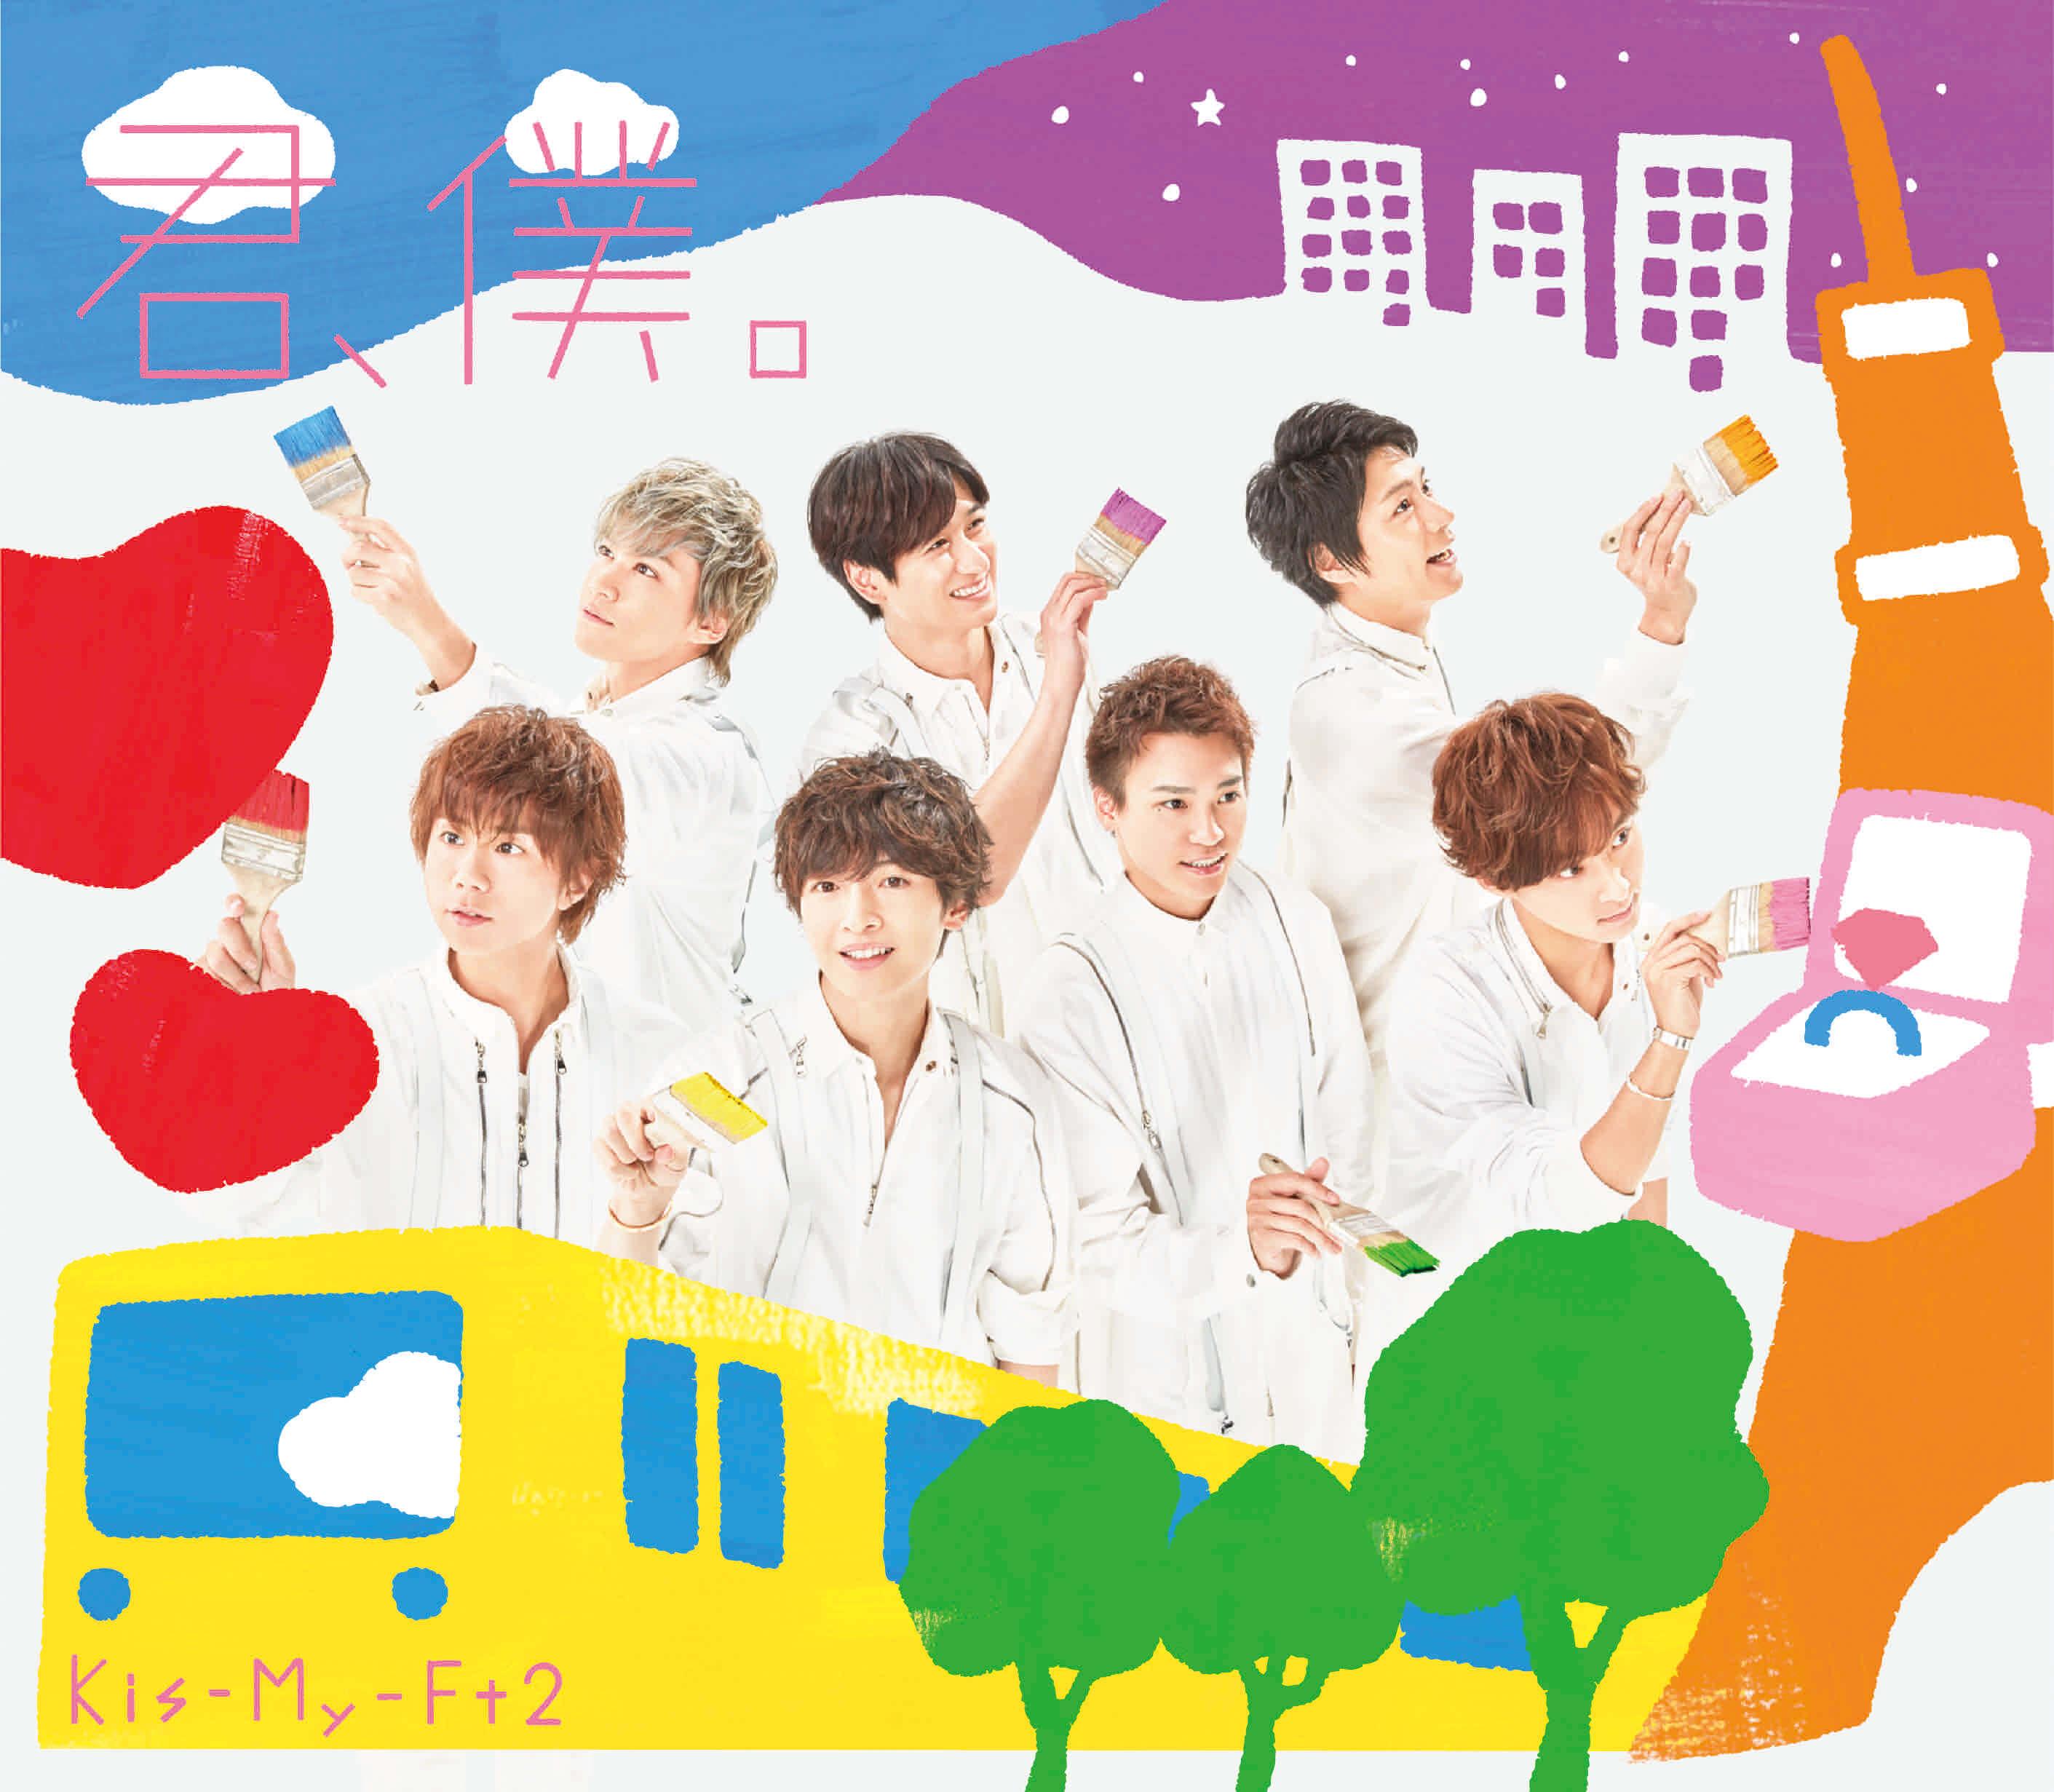 Kis-My-Ft2出道以來連續22次Oricon1位達成! Kis-My-Ft2_、